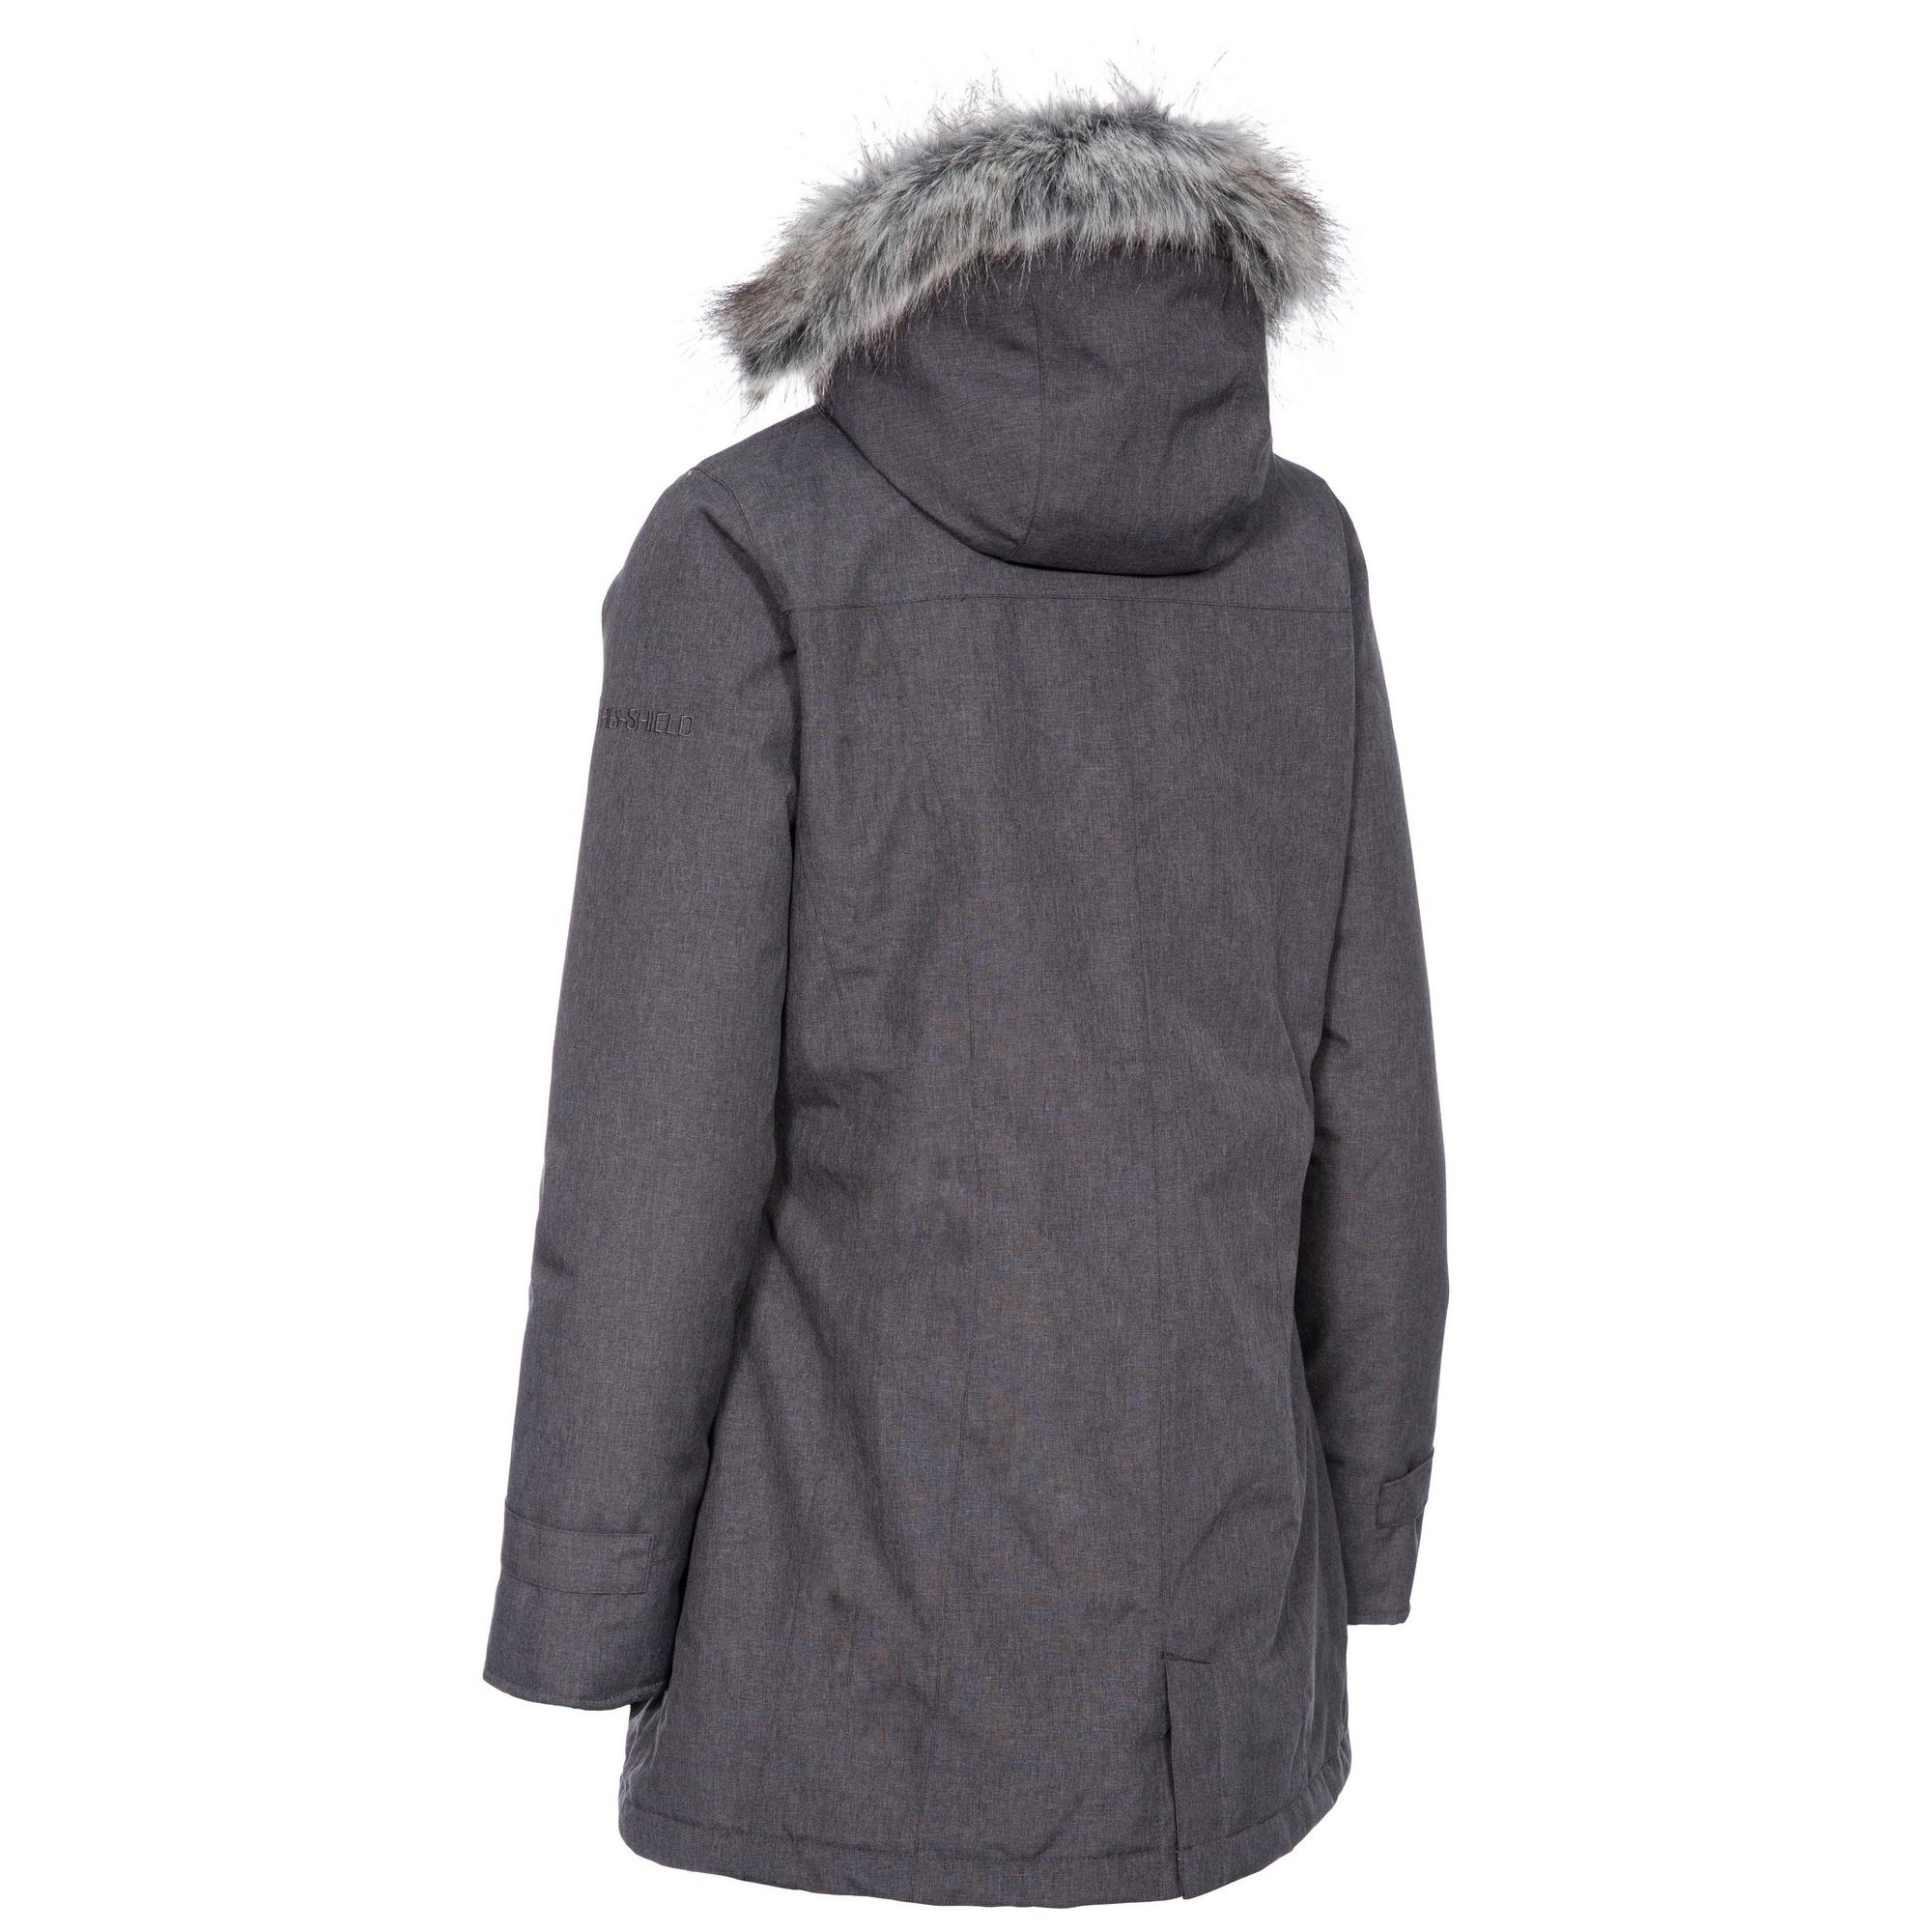 Trespass-Womens-Ladies-Daybyday-Waterproof-Jacket-TP4759 thumbnail 4